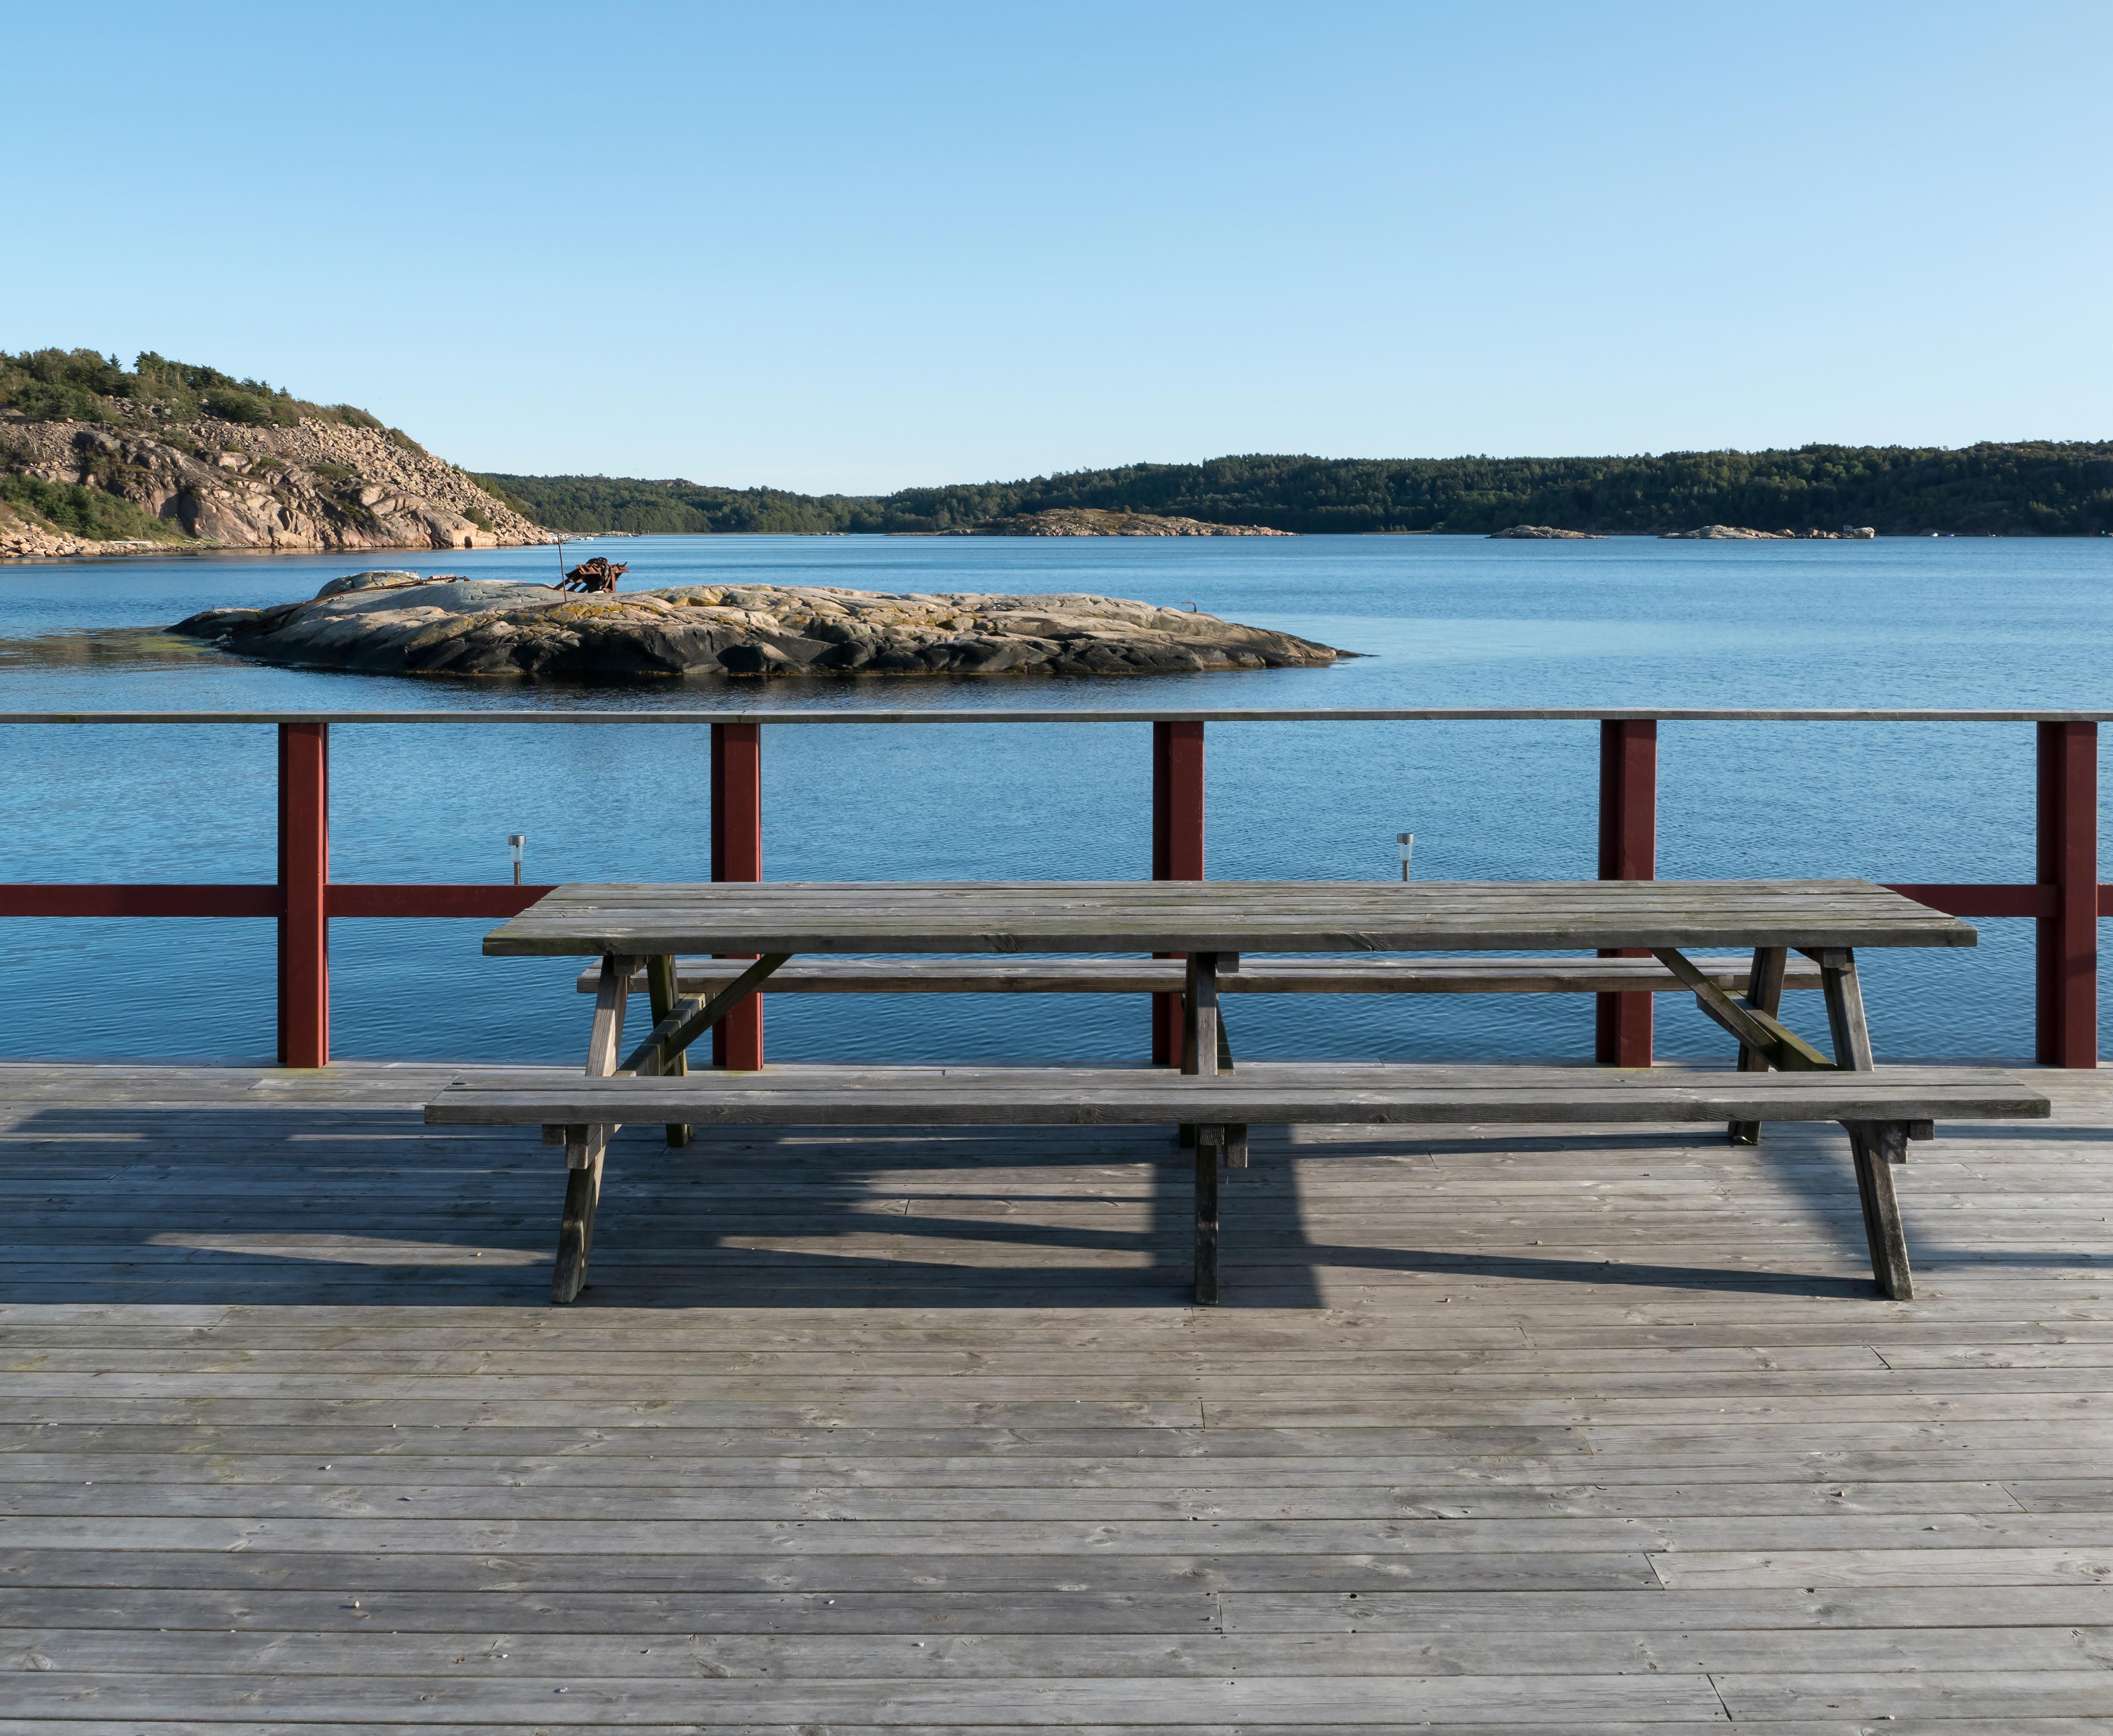 Picnic area overlooking Trommekilen 1, Bay, Blue, Cliffs, Forest, HQ Photo